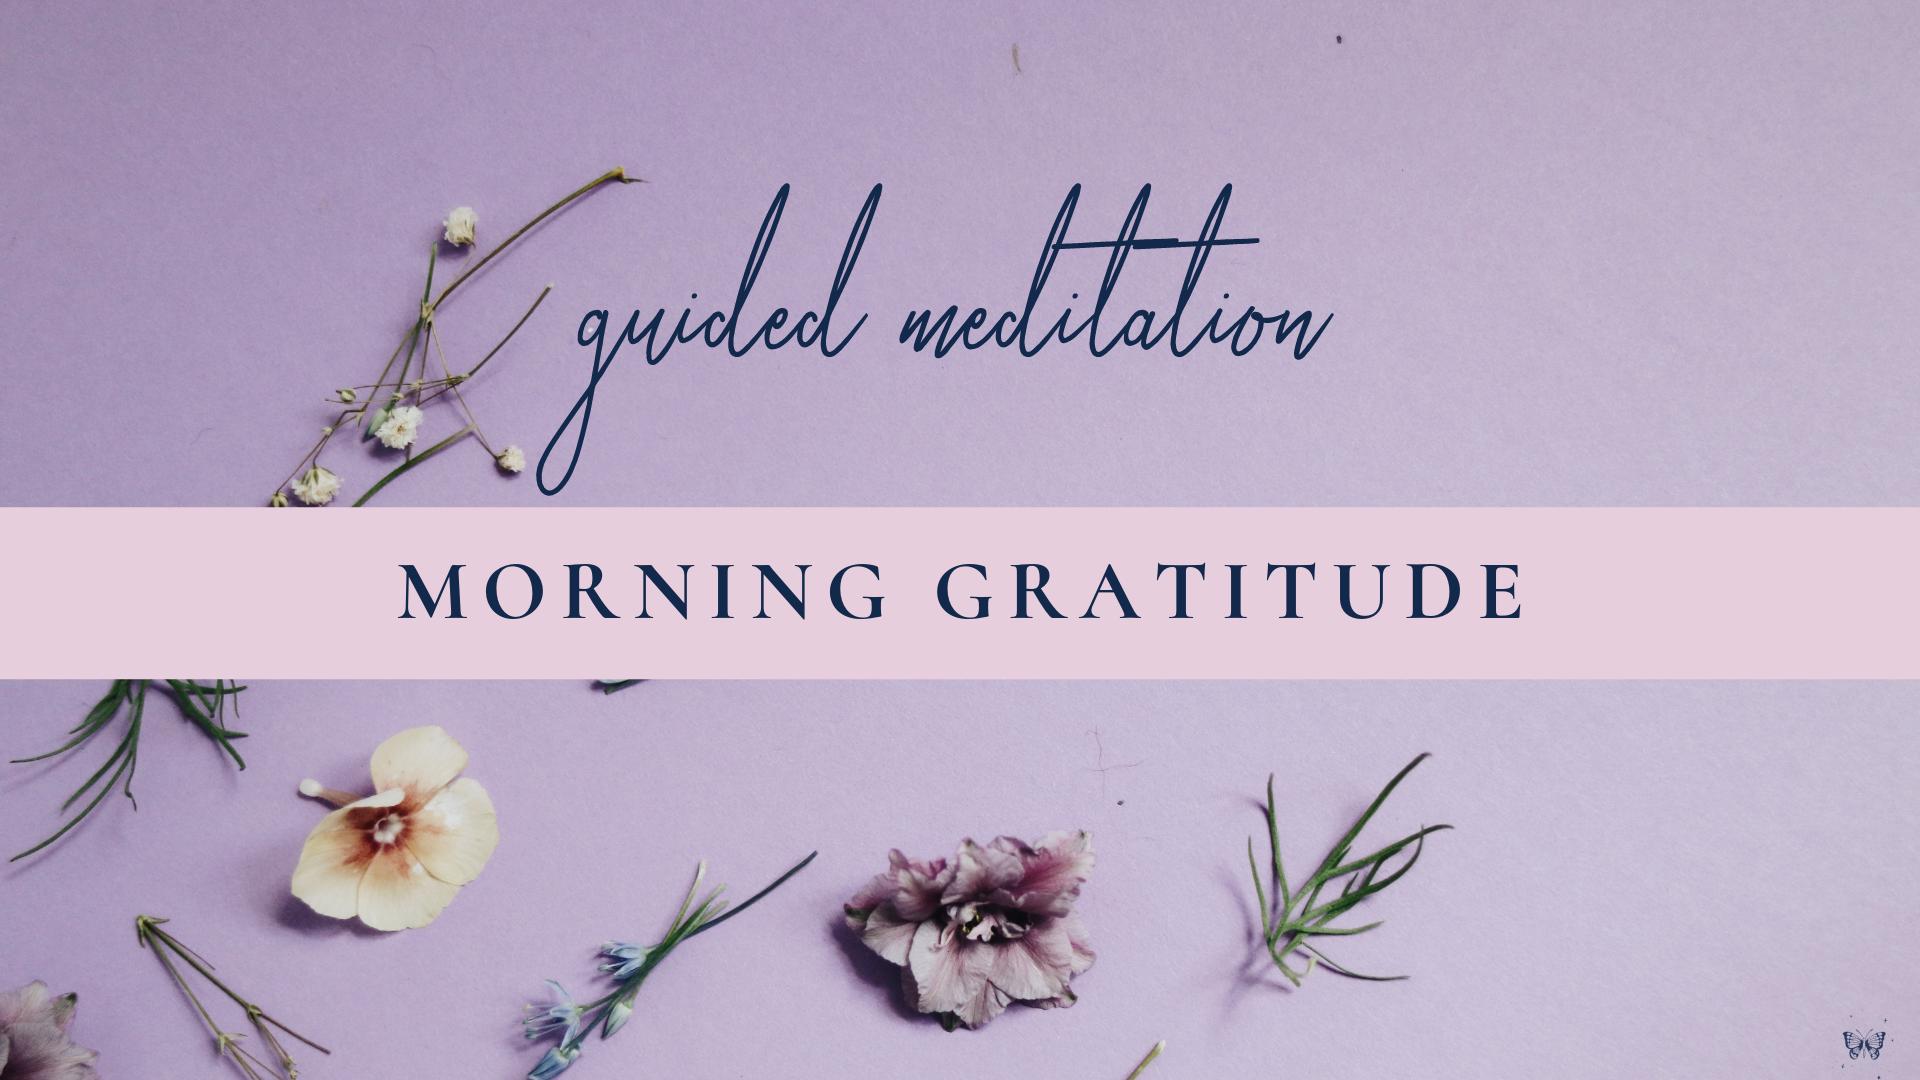 MorningGratitudeMed.png